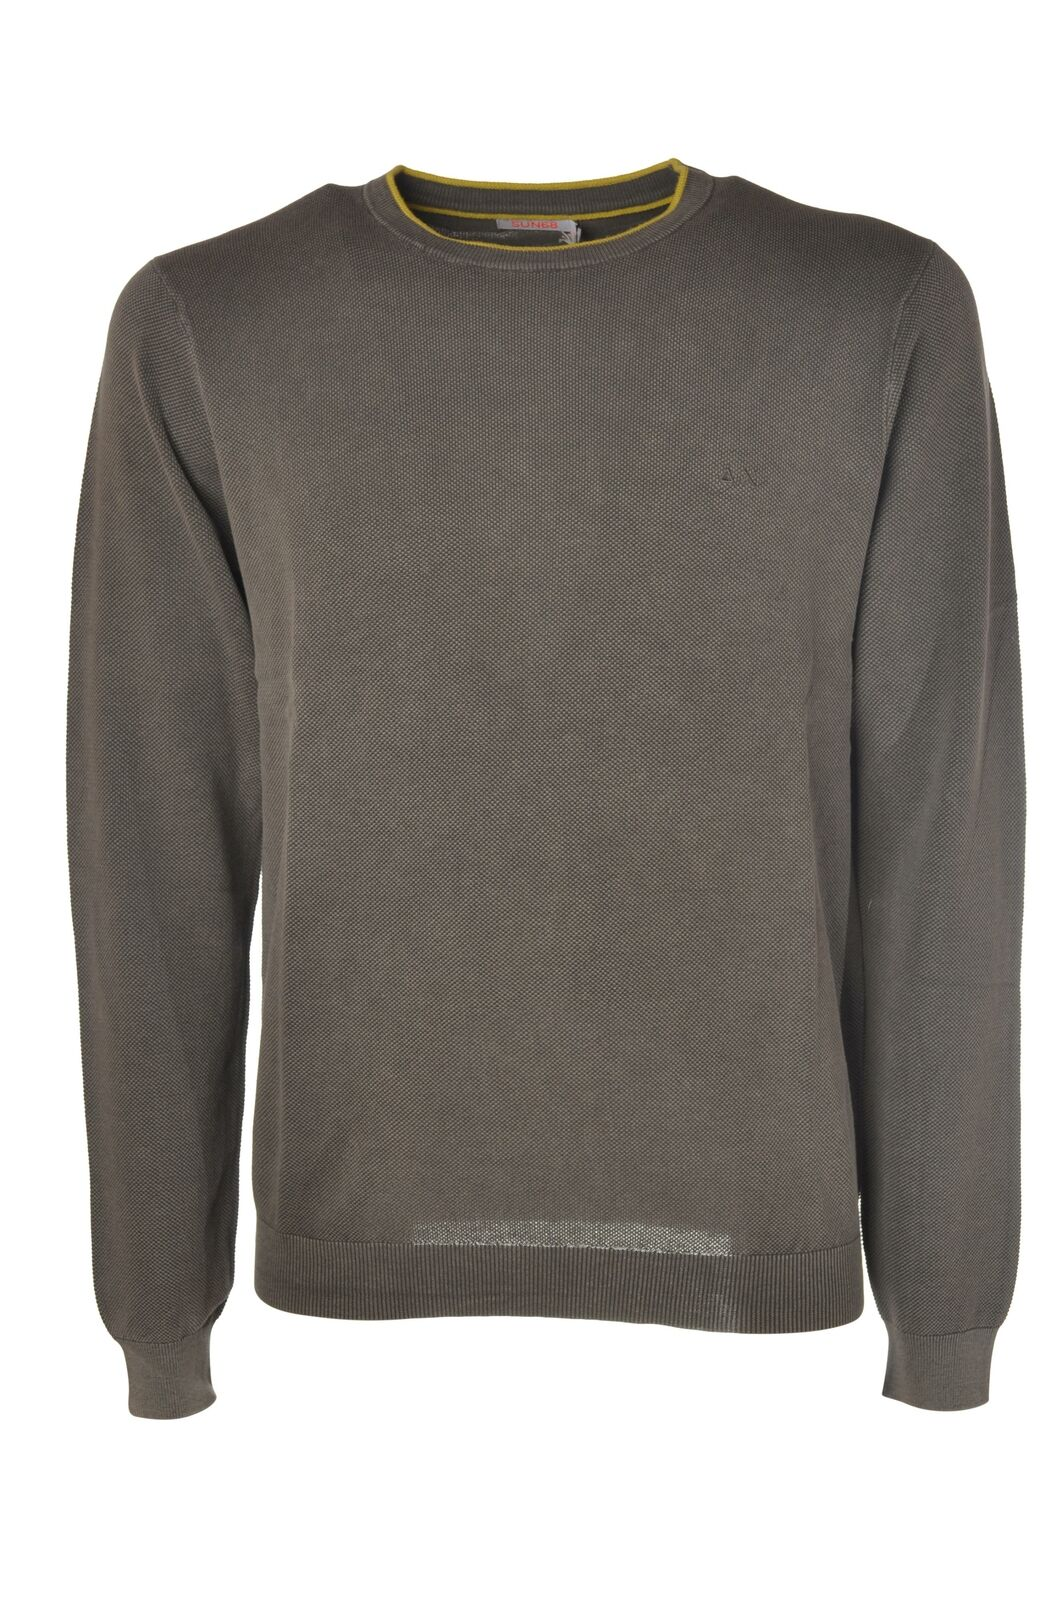 Sun 68 - Knitwear-Sweaters - Man - Green - 5988712C190719